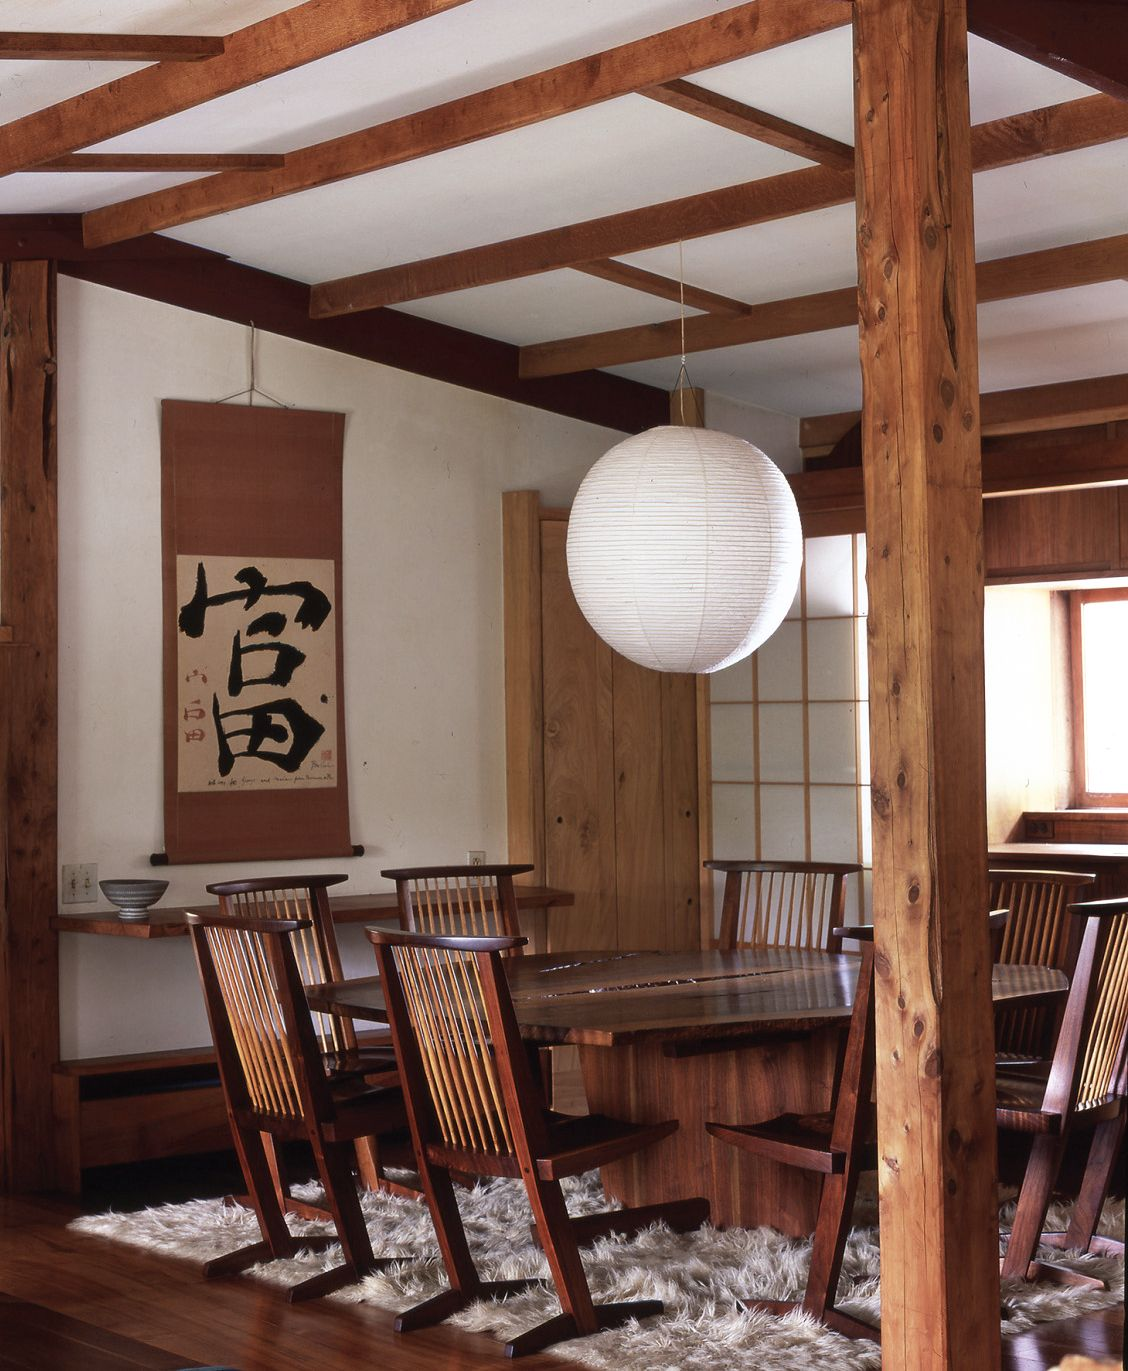 GEORGE NAKASHIMA Interior at the Reception House